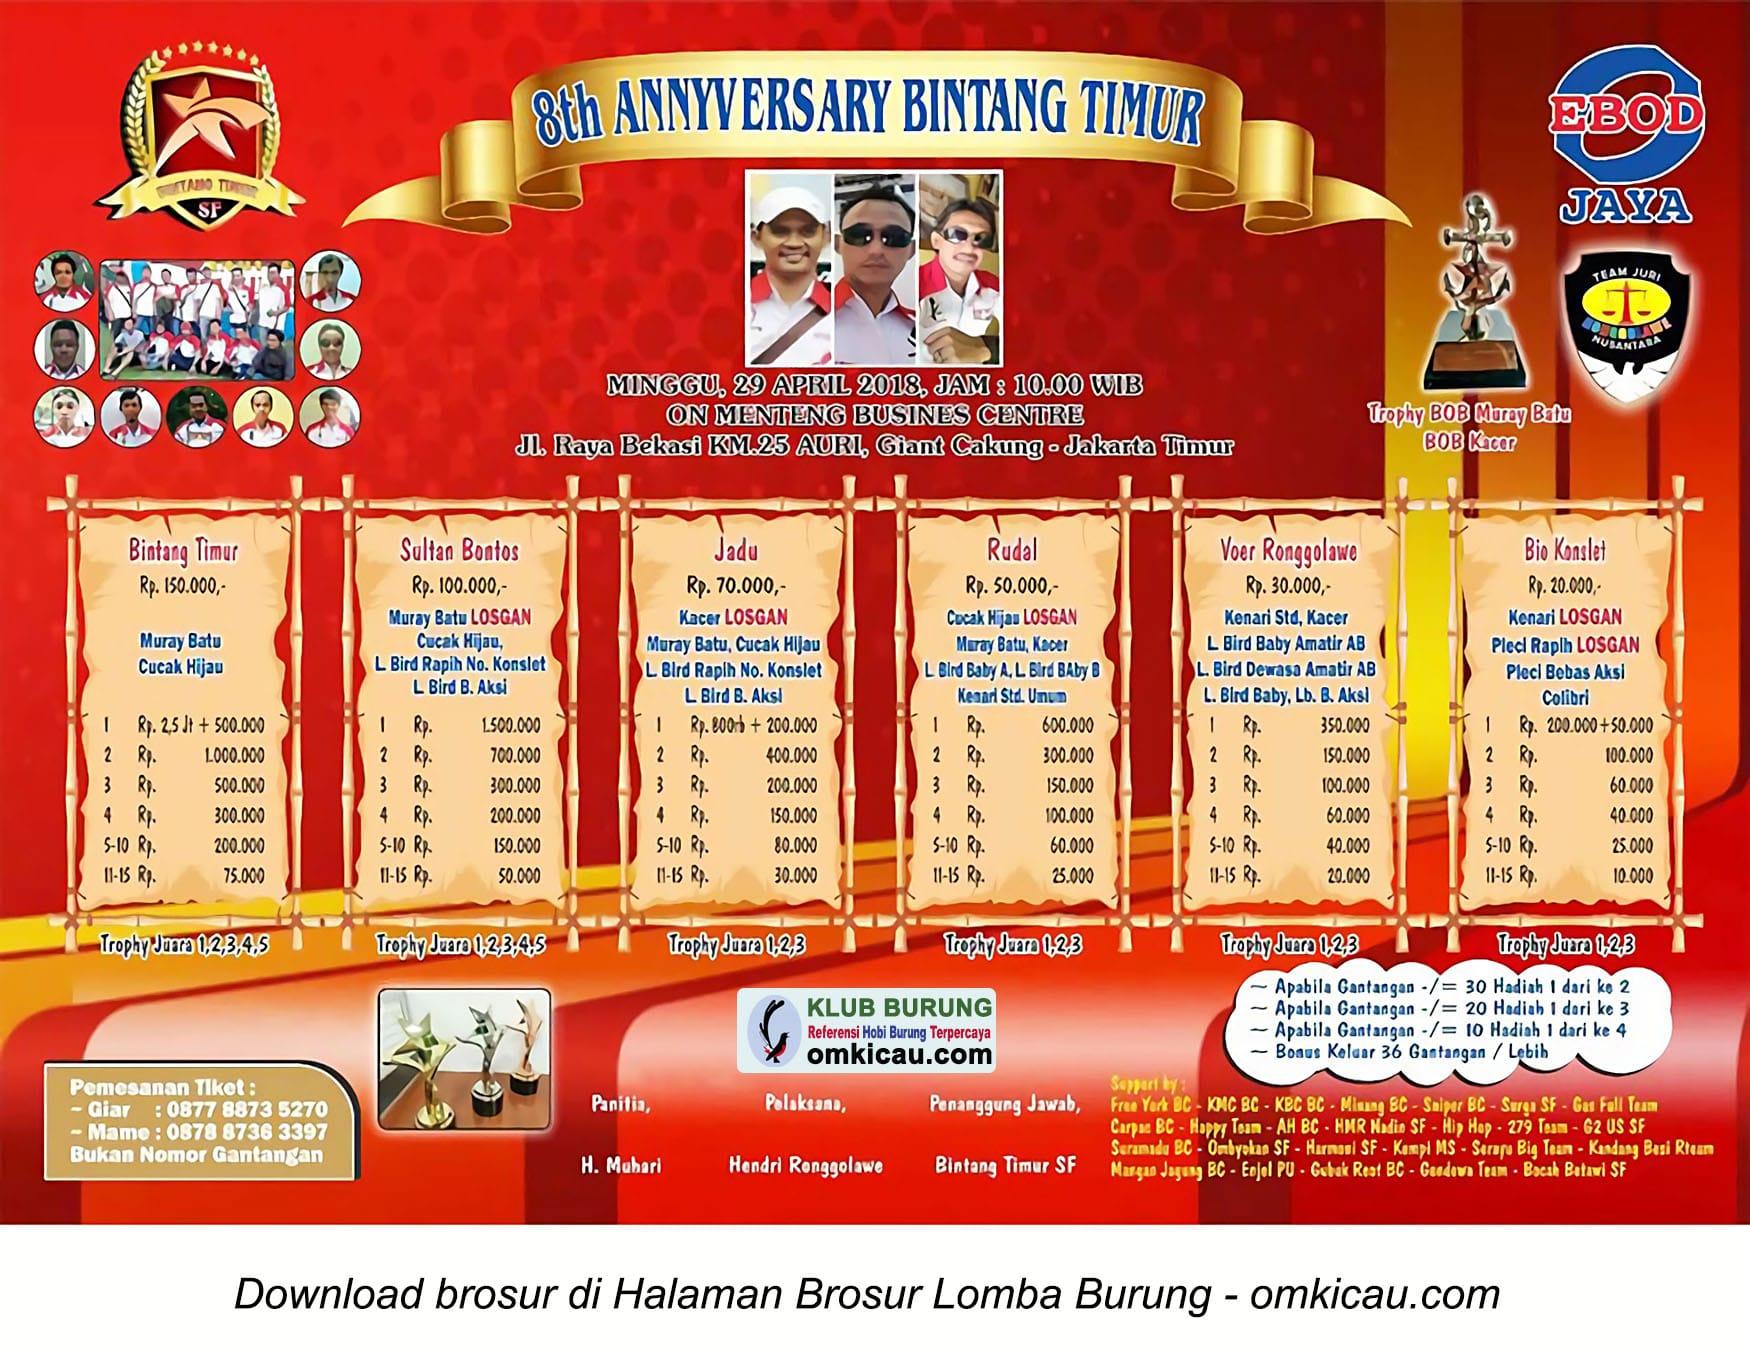 8th Anniversary Bintang Timur